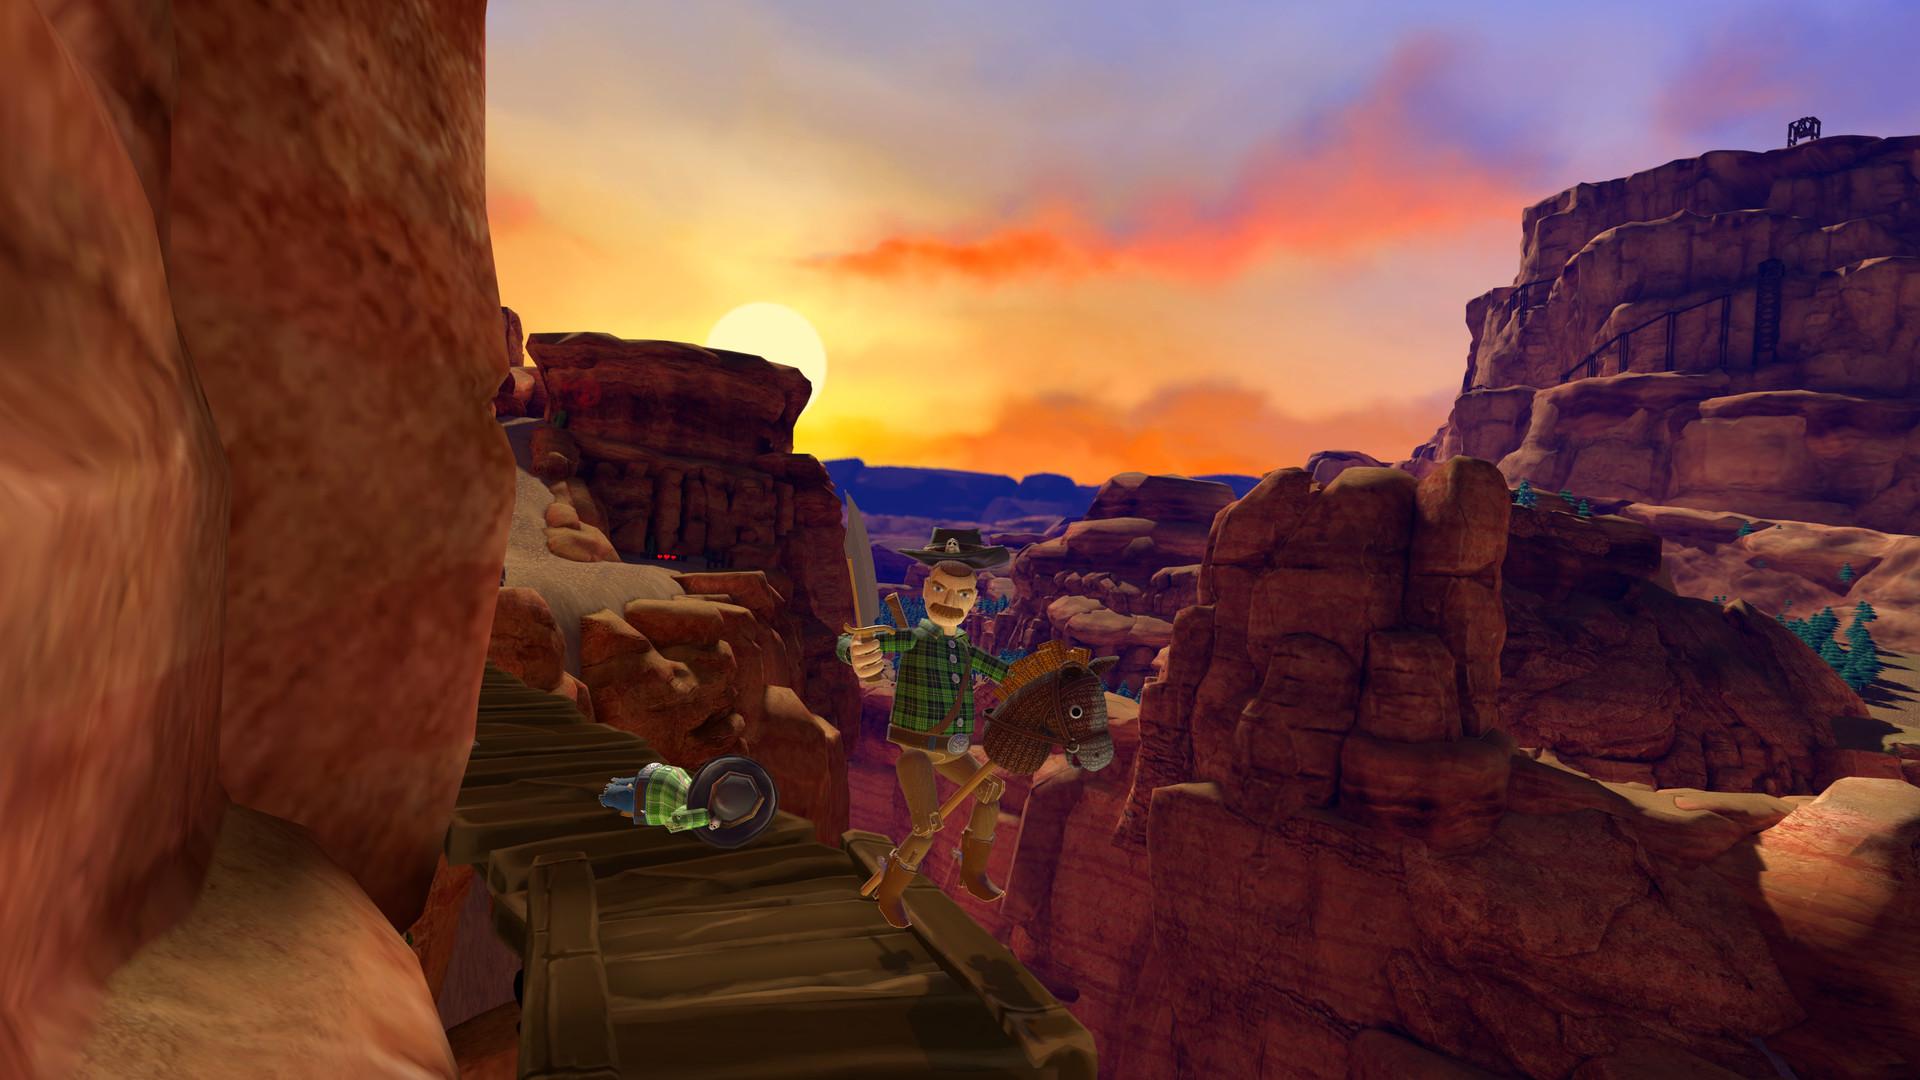 Hopalong The Badlands Invites You to a VR Wild West, Pardner